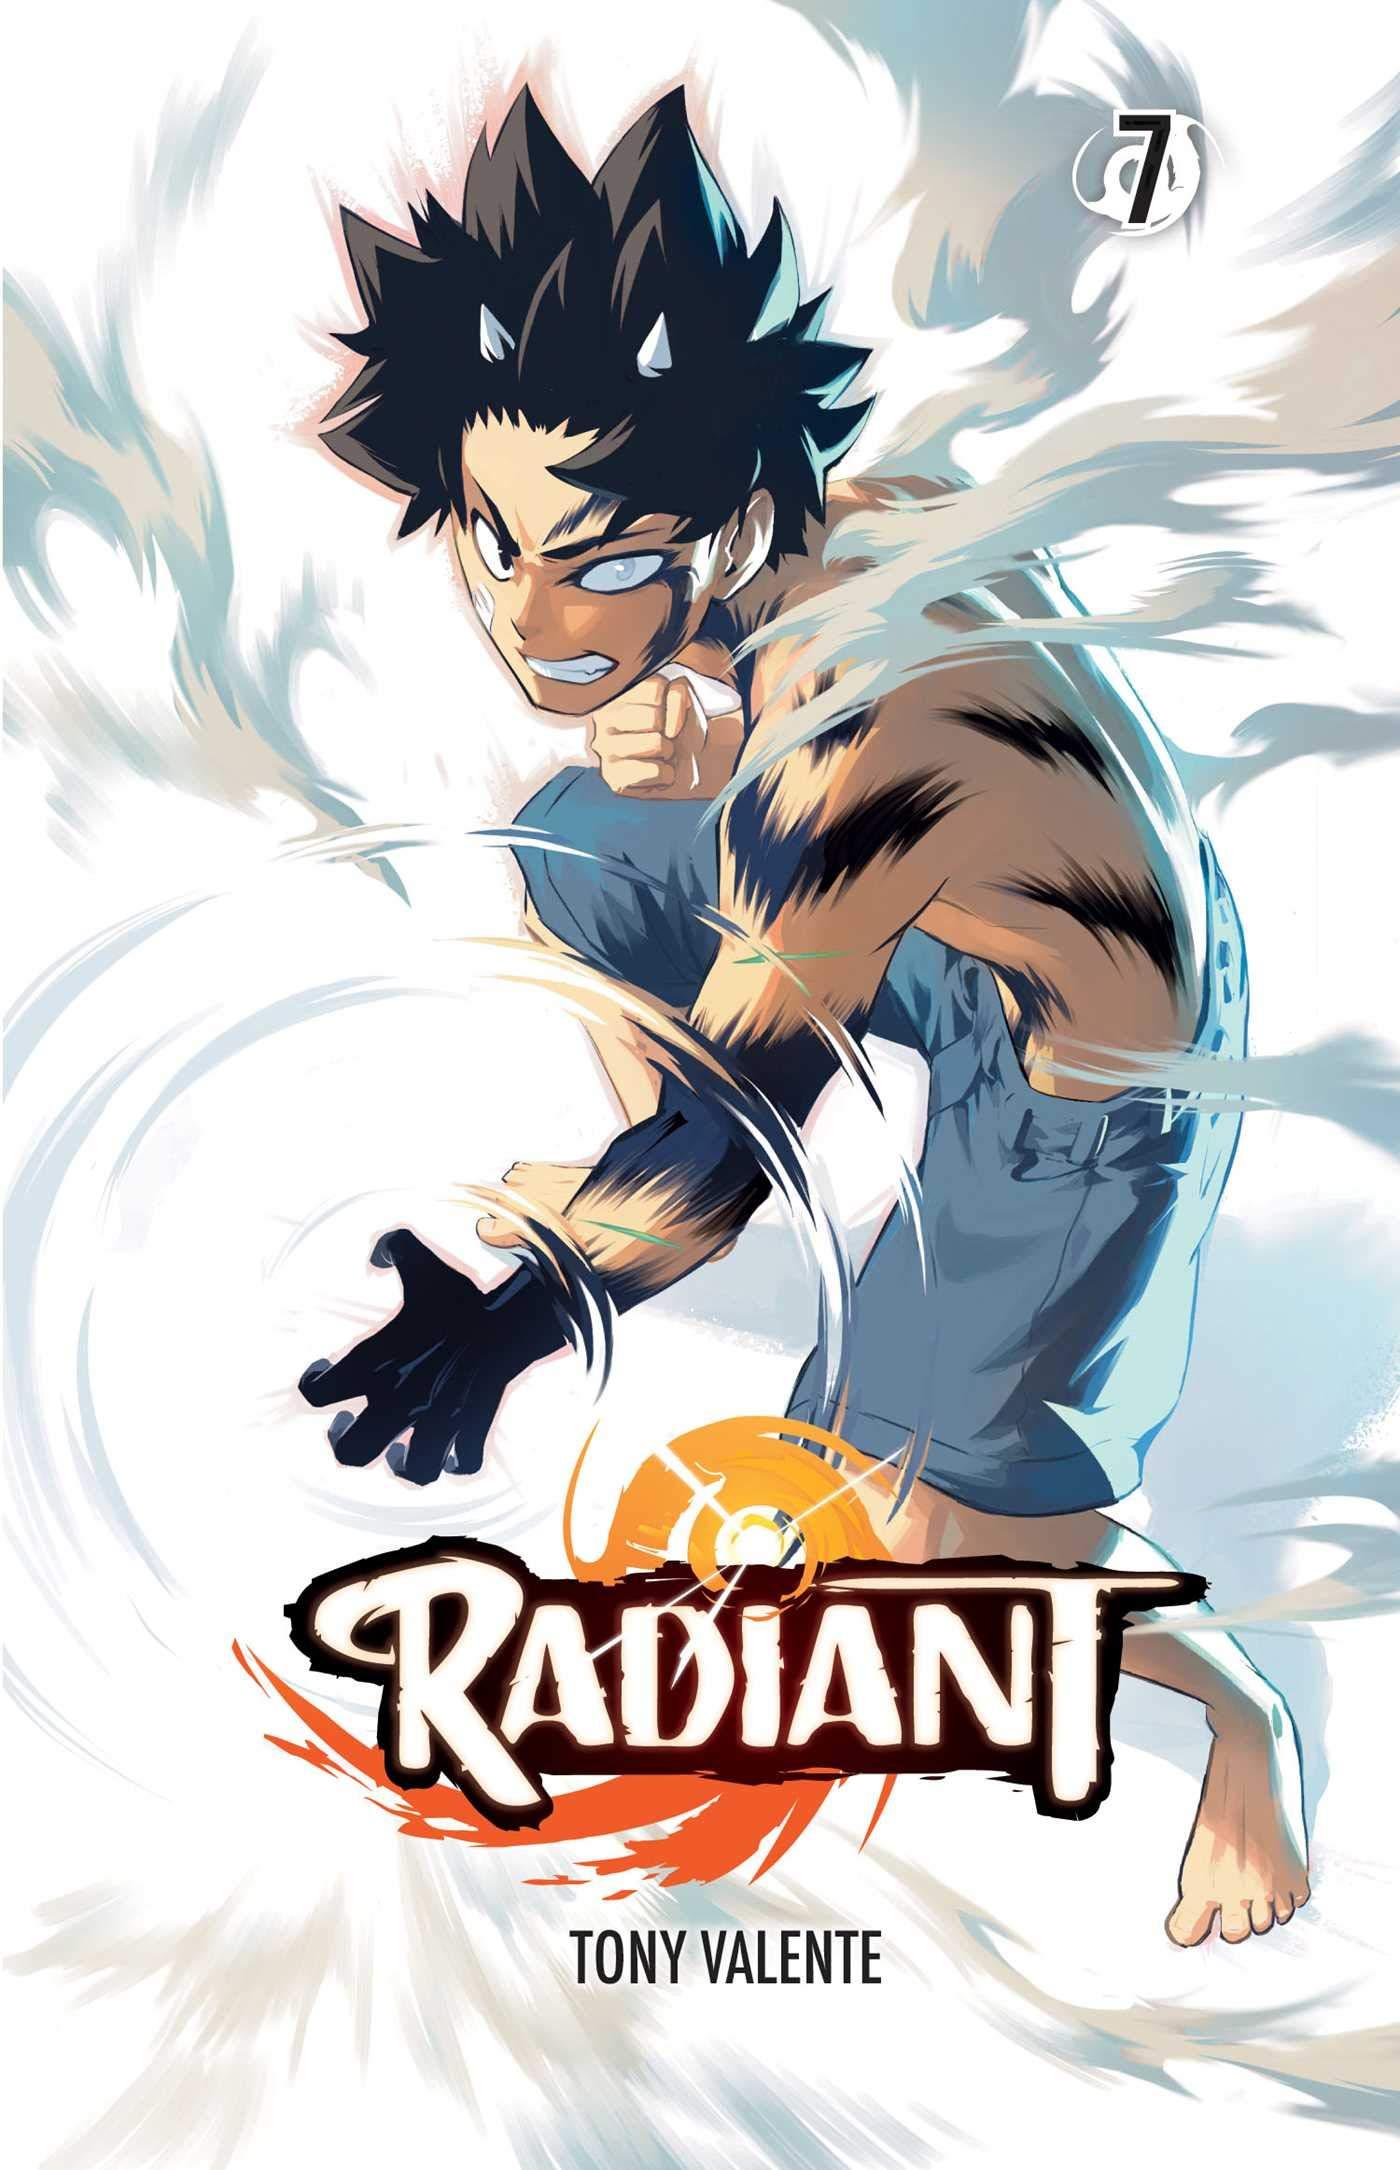 Radiant Vol 7 Tony Valente product image